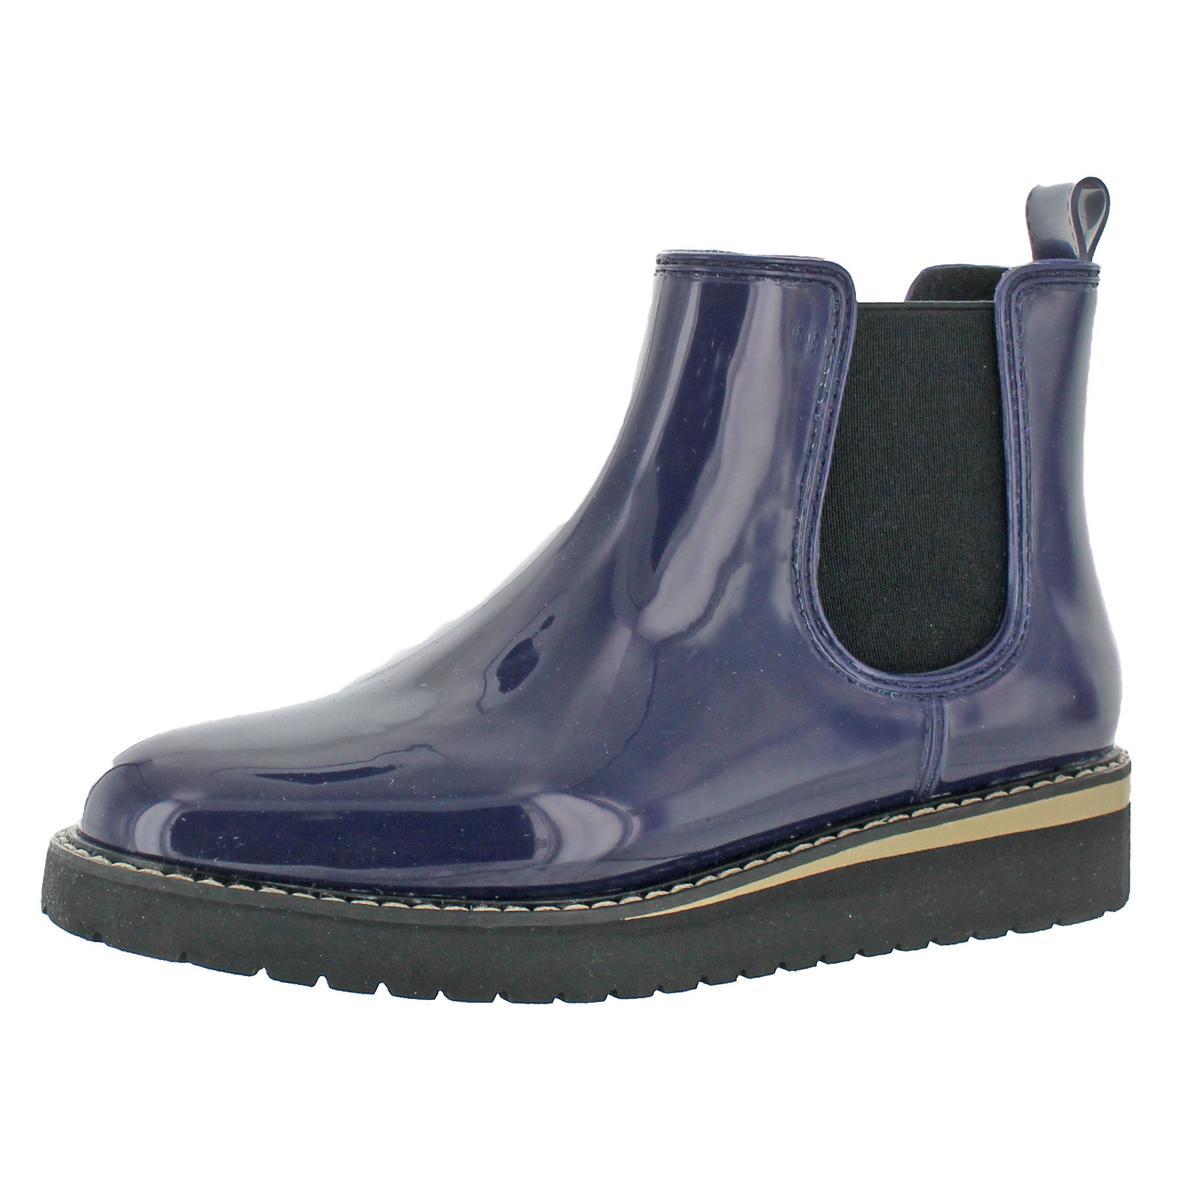 78731fb7e73b Details about Cougar Womens Kensington Navy EVA Rain Boots Shoes 7 Medium  (B